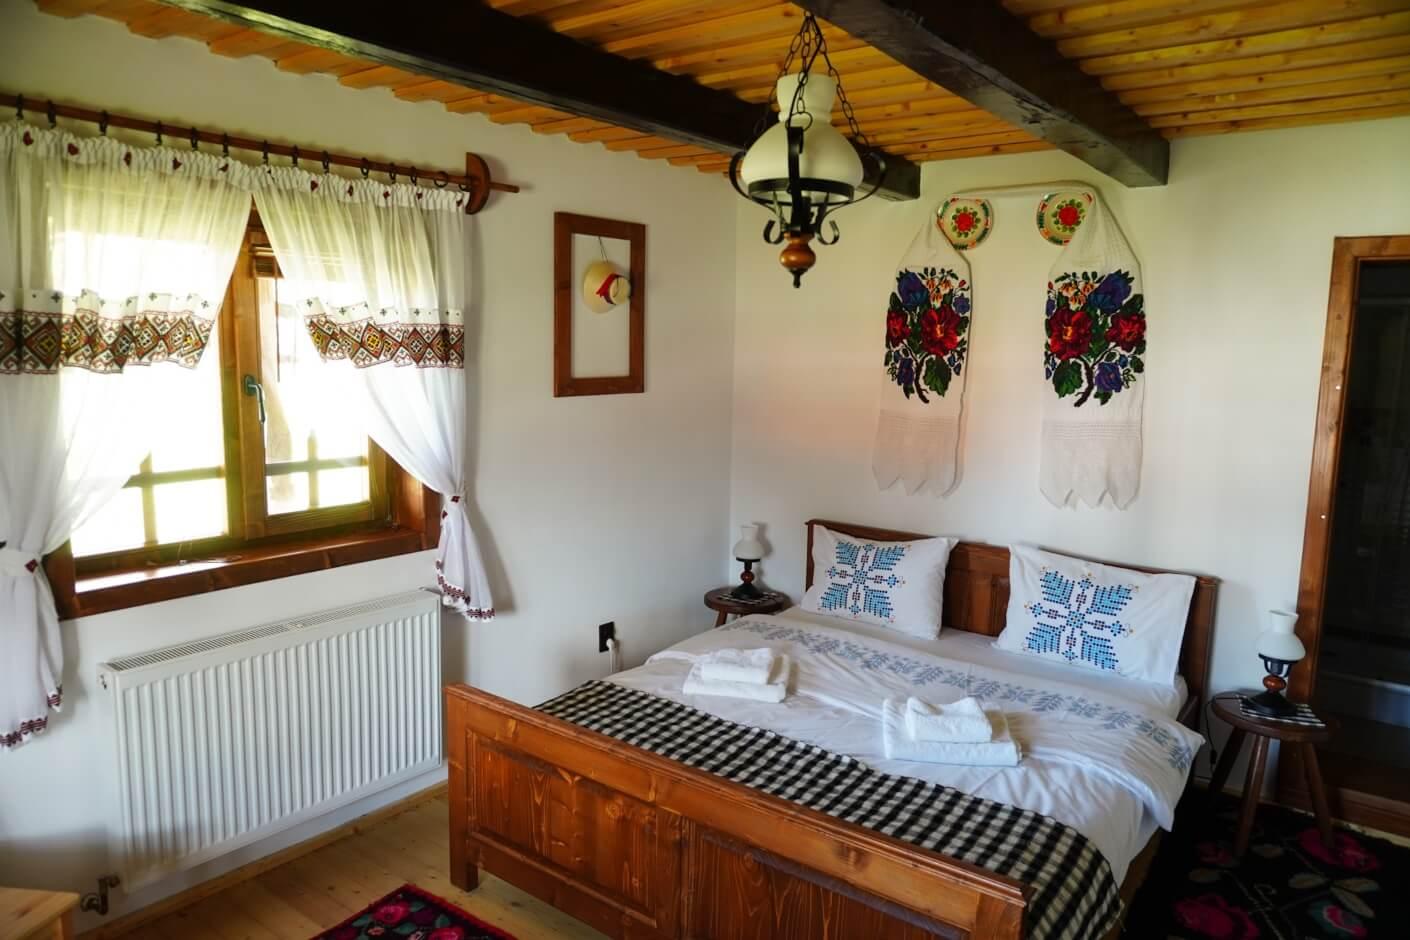 double room at Casa din Susani, Maramureș, Romania